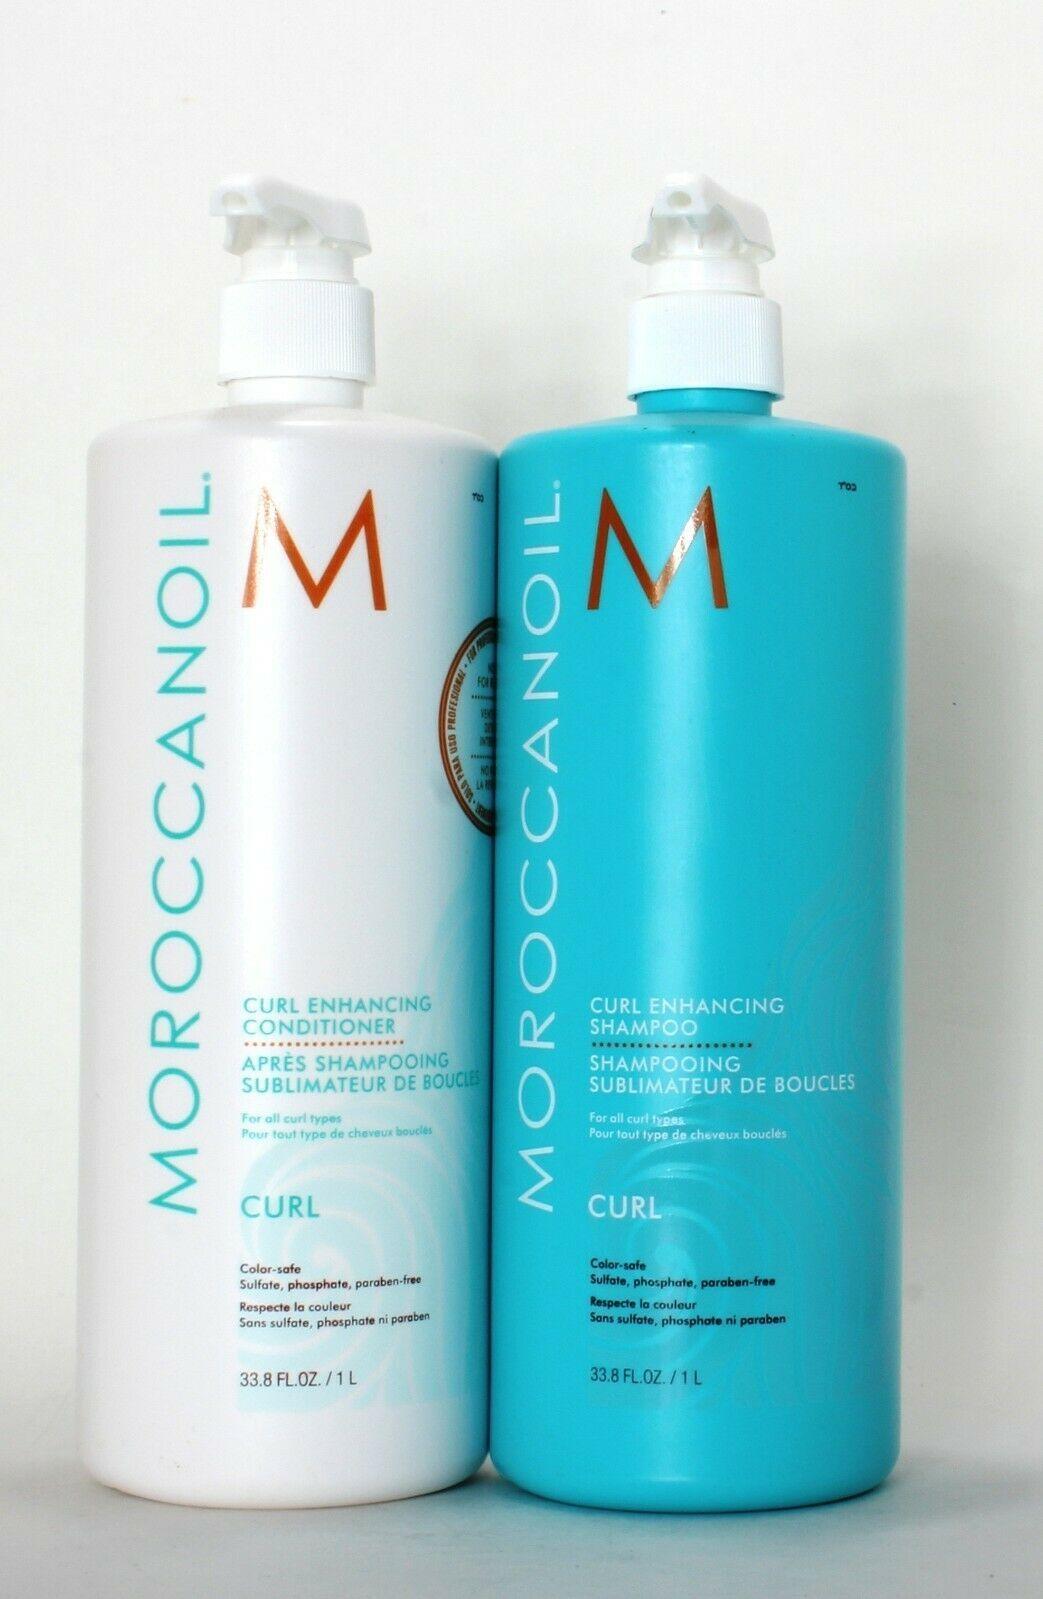 Moroccanoil Curl Enhancing Shampoo And Conditioner 33.8 Fl oz - $99.99